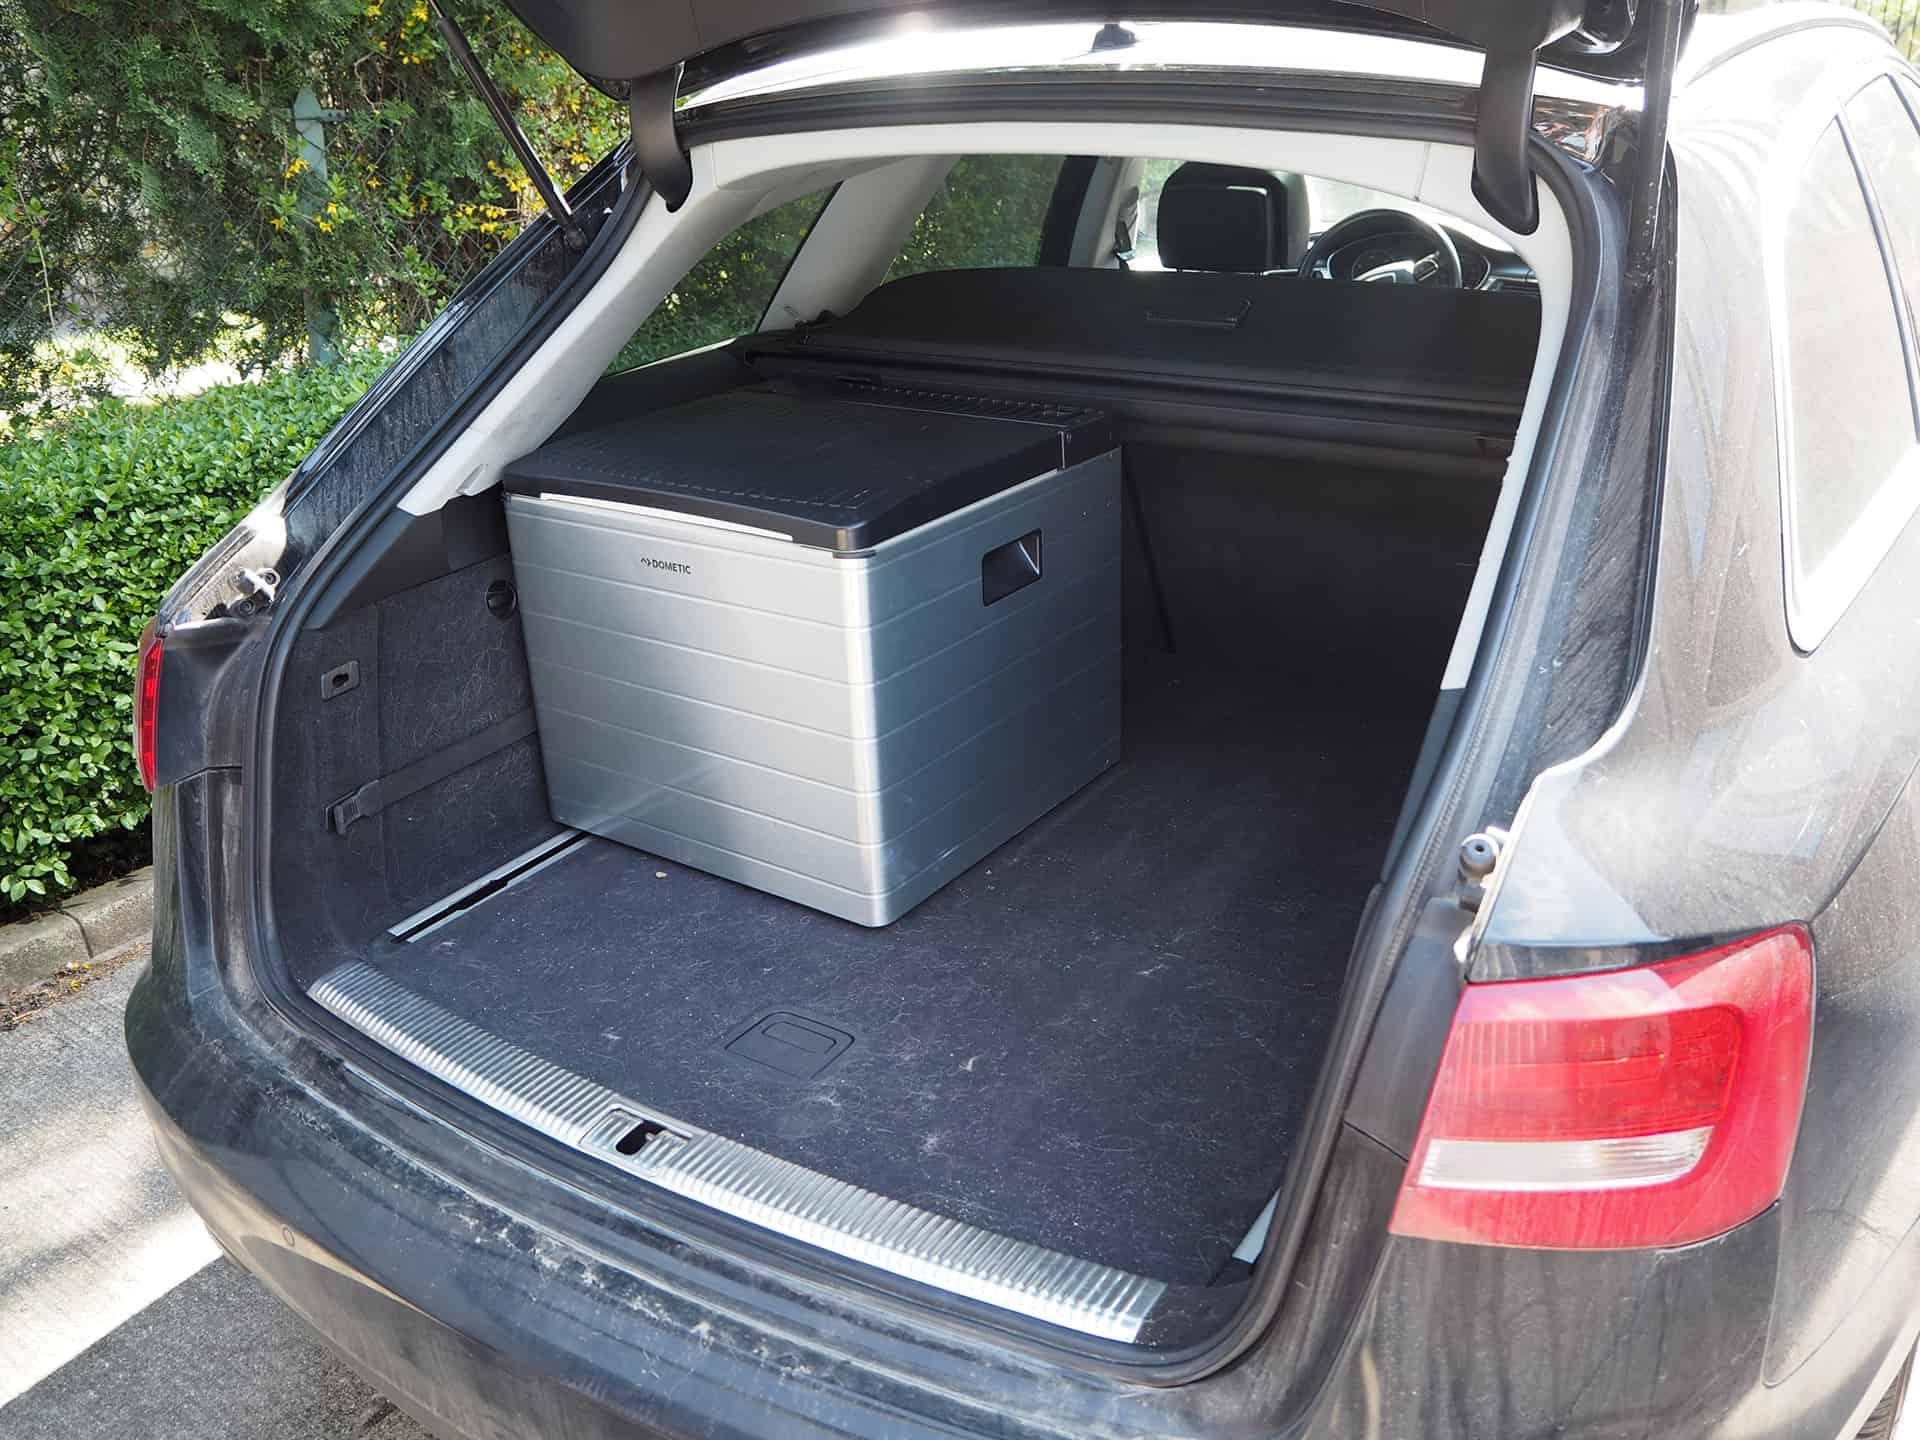 Der Dometic CombiCool RC 2200 Campingkühlschrank im Kofferraum eines Audi A6 Avant